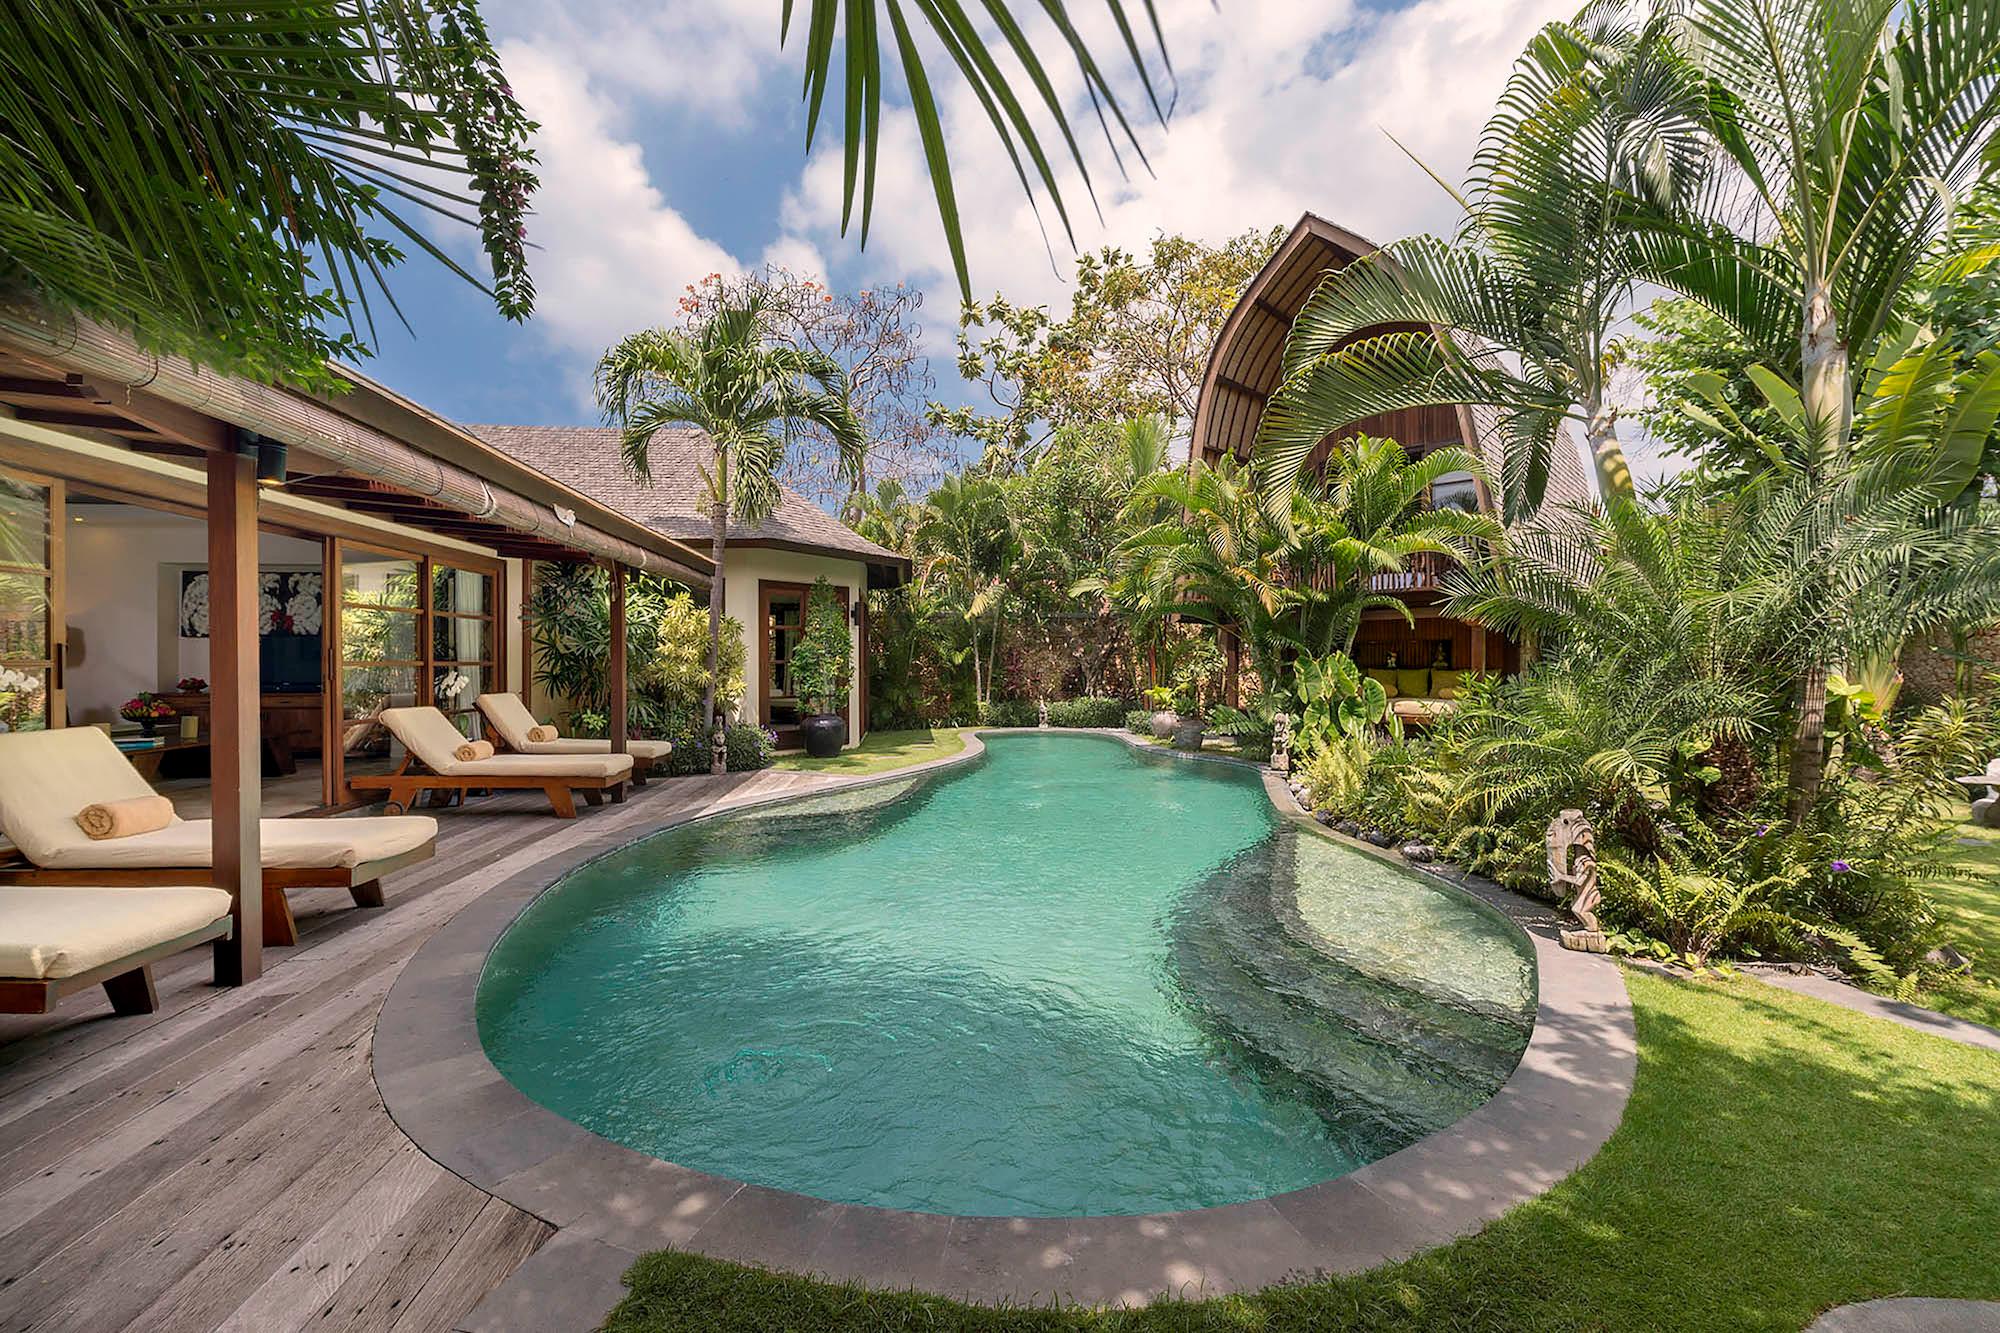 Lataliana Villas – Quintessential Luxury Villa in Bali